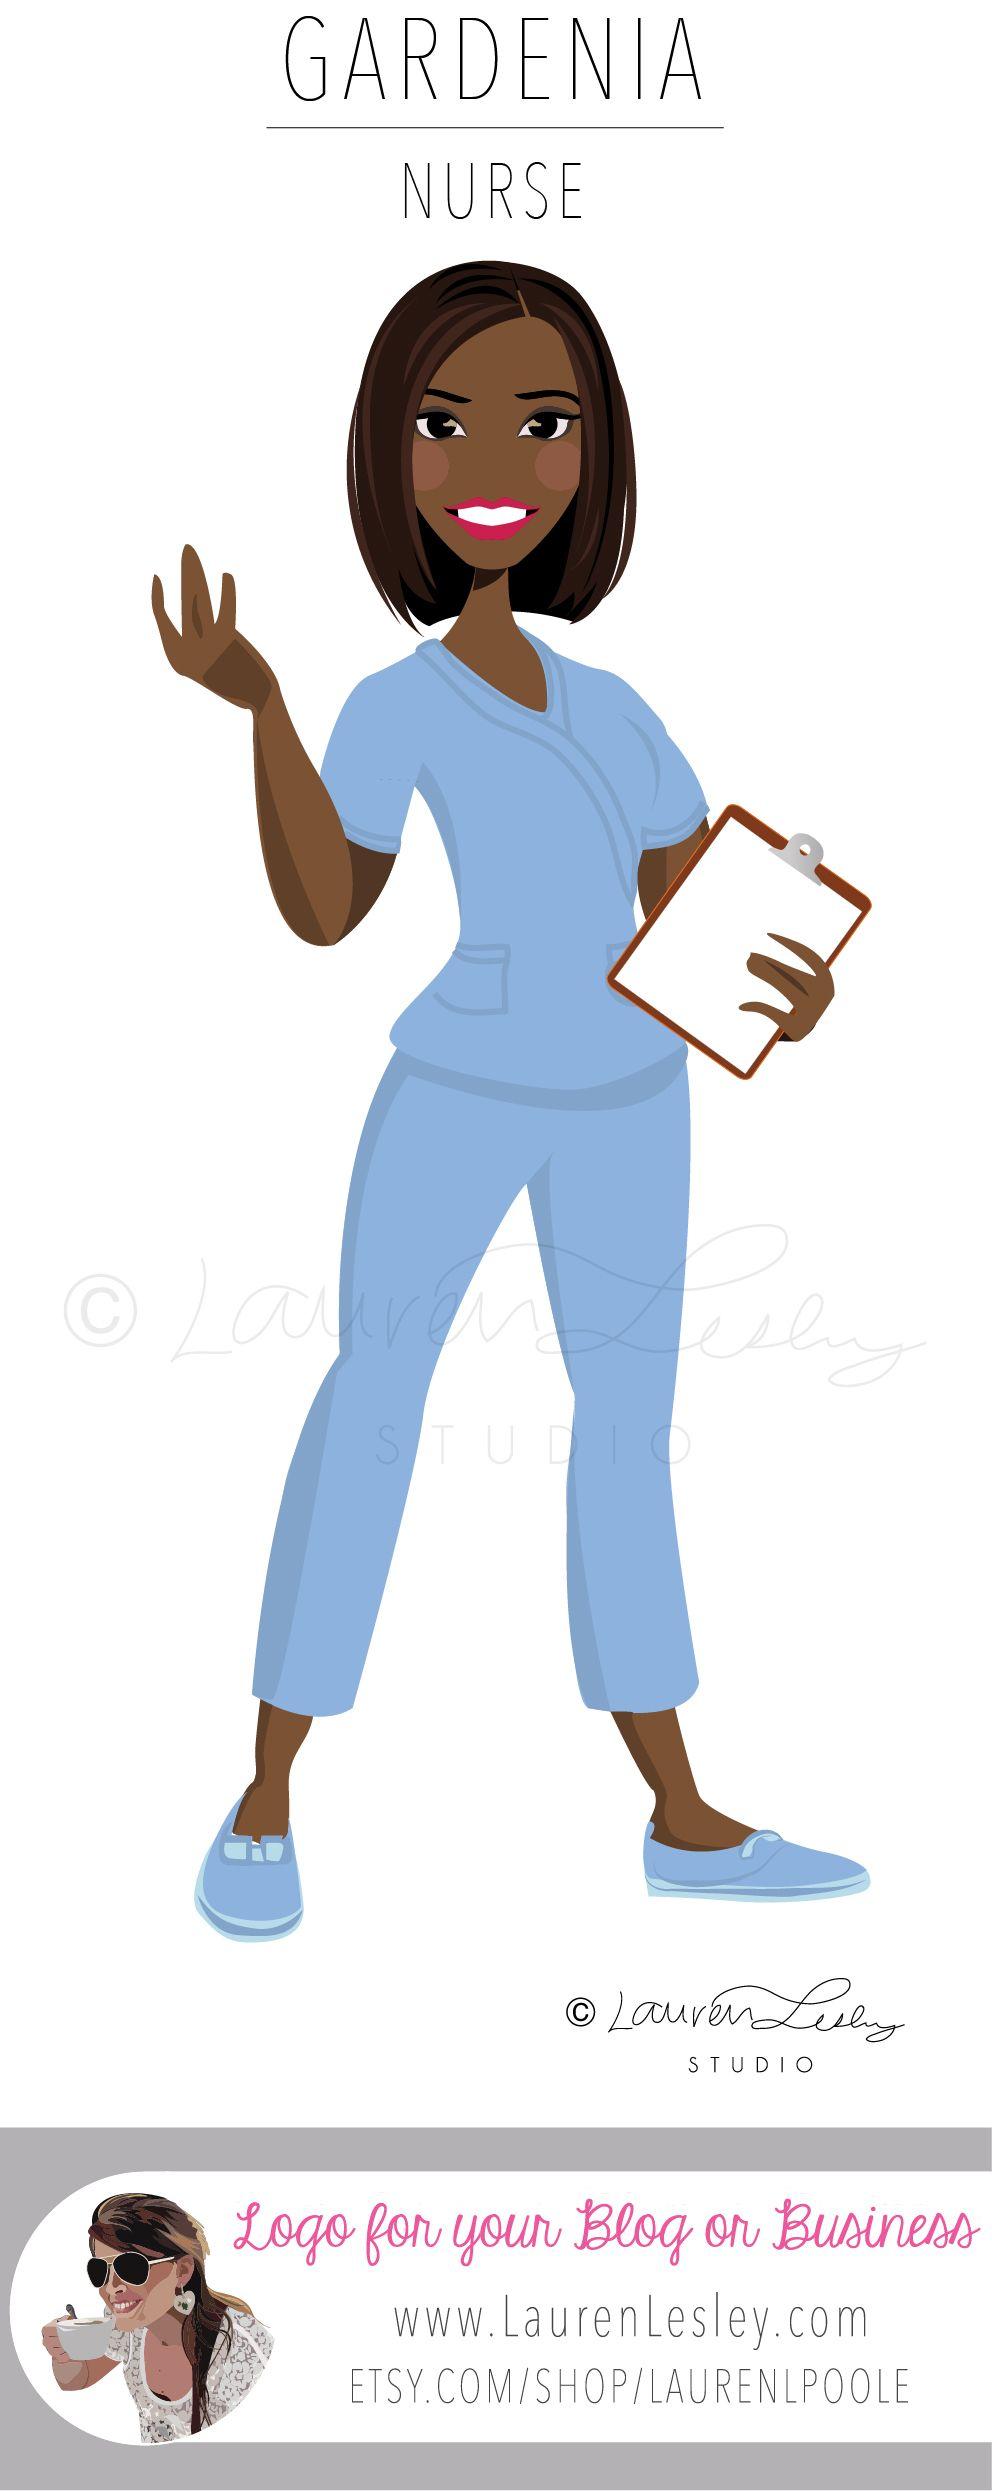 Nurse Illustration Logo Medical Tips & Advice Medical